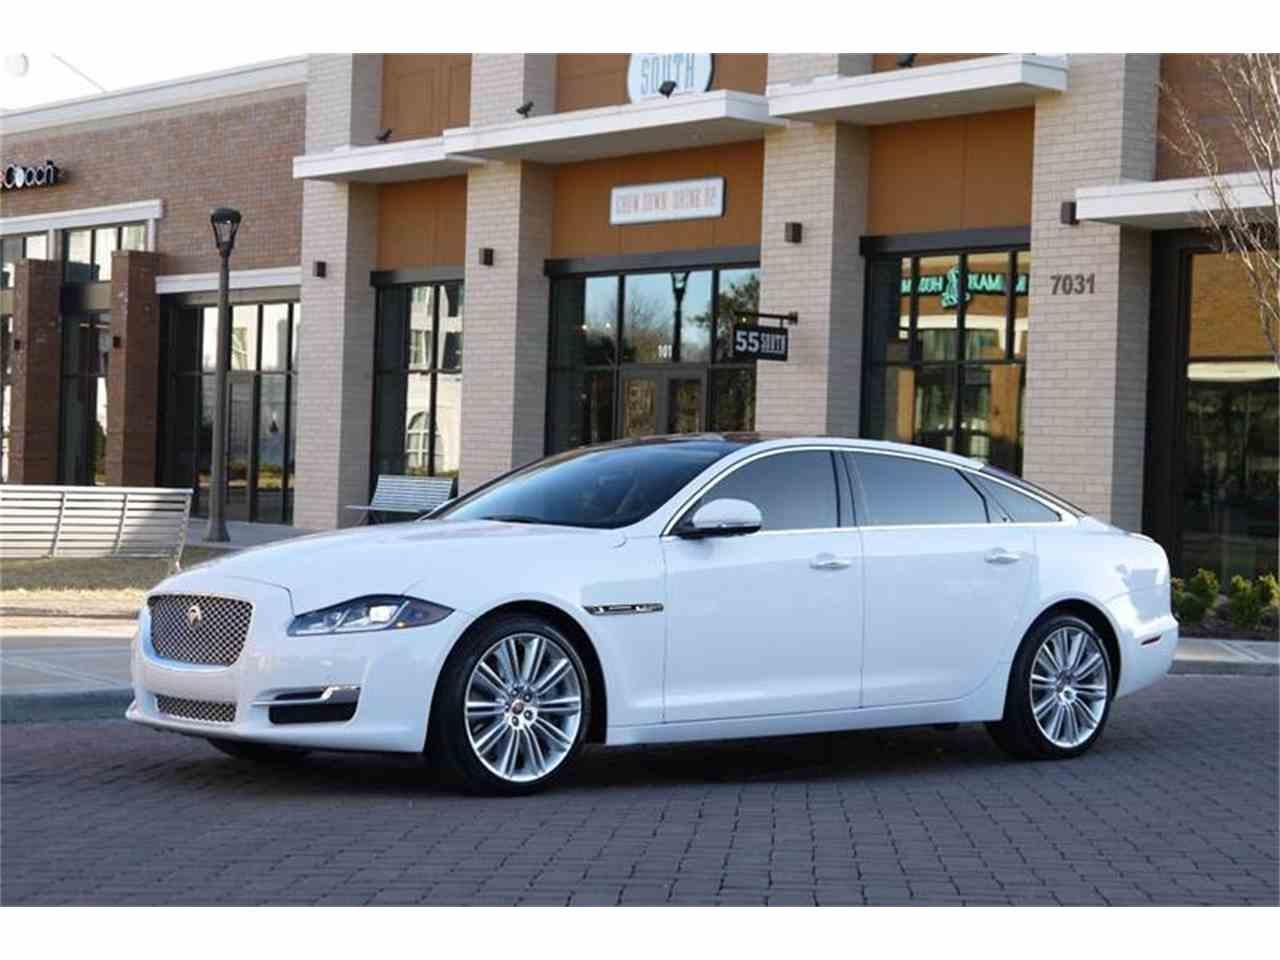 All Types 2016 xj : 2016 Jaguar XJ for Sale | ClassicCars.com | CC-1061442